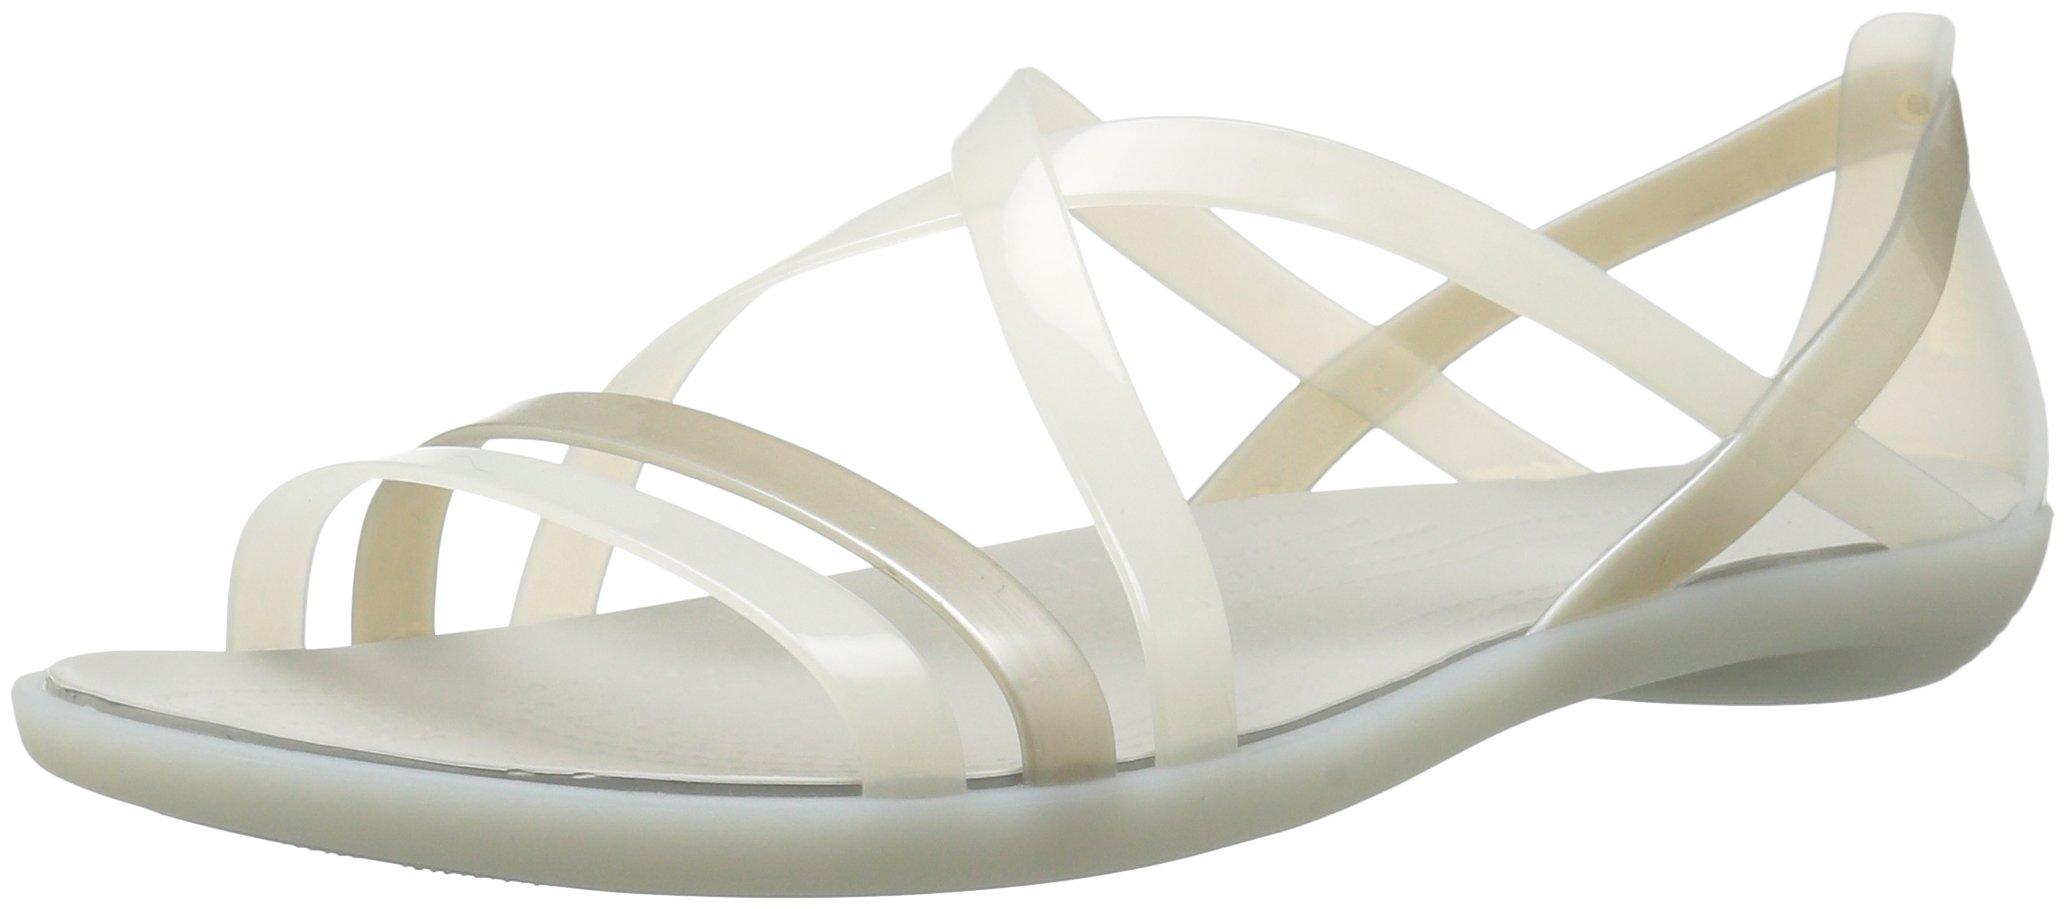 Crocs Women's Isabella Strappy W Flat Sandal, Oyster/Pearl White, 7 M US